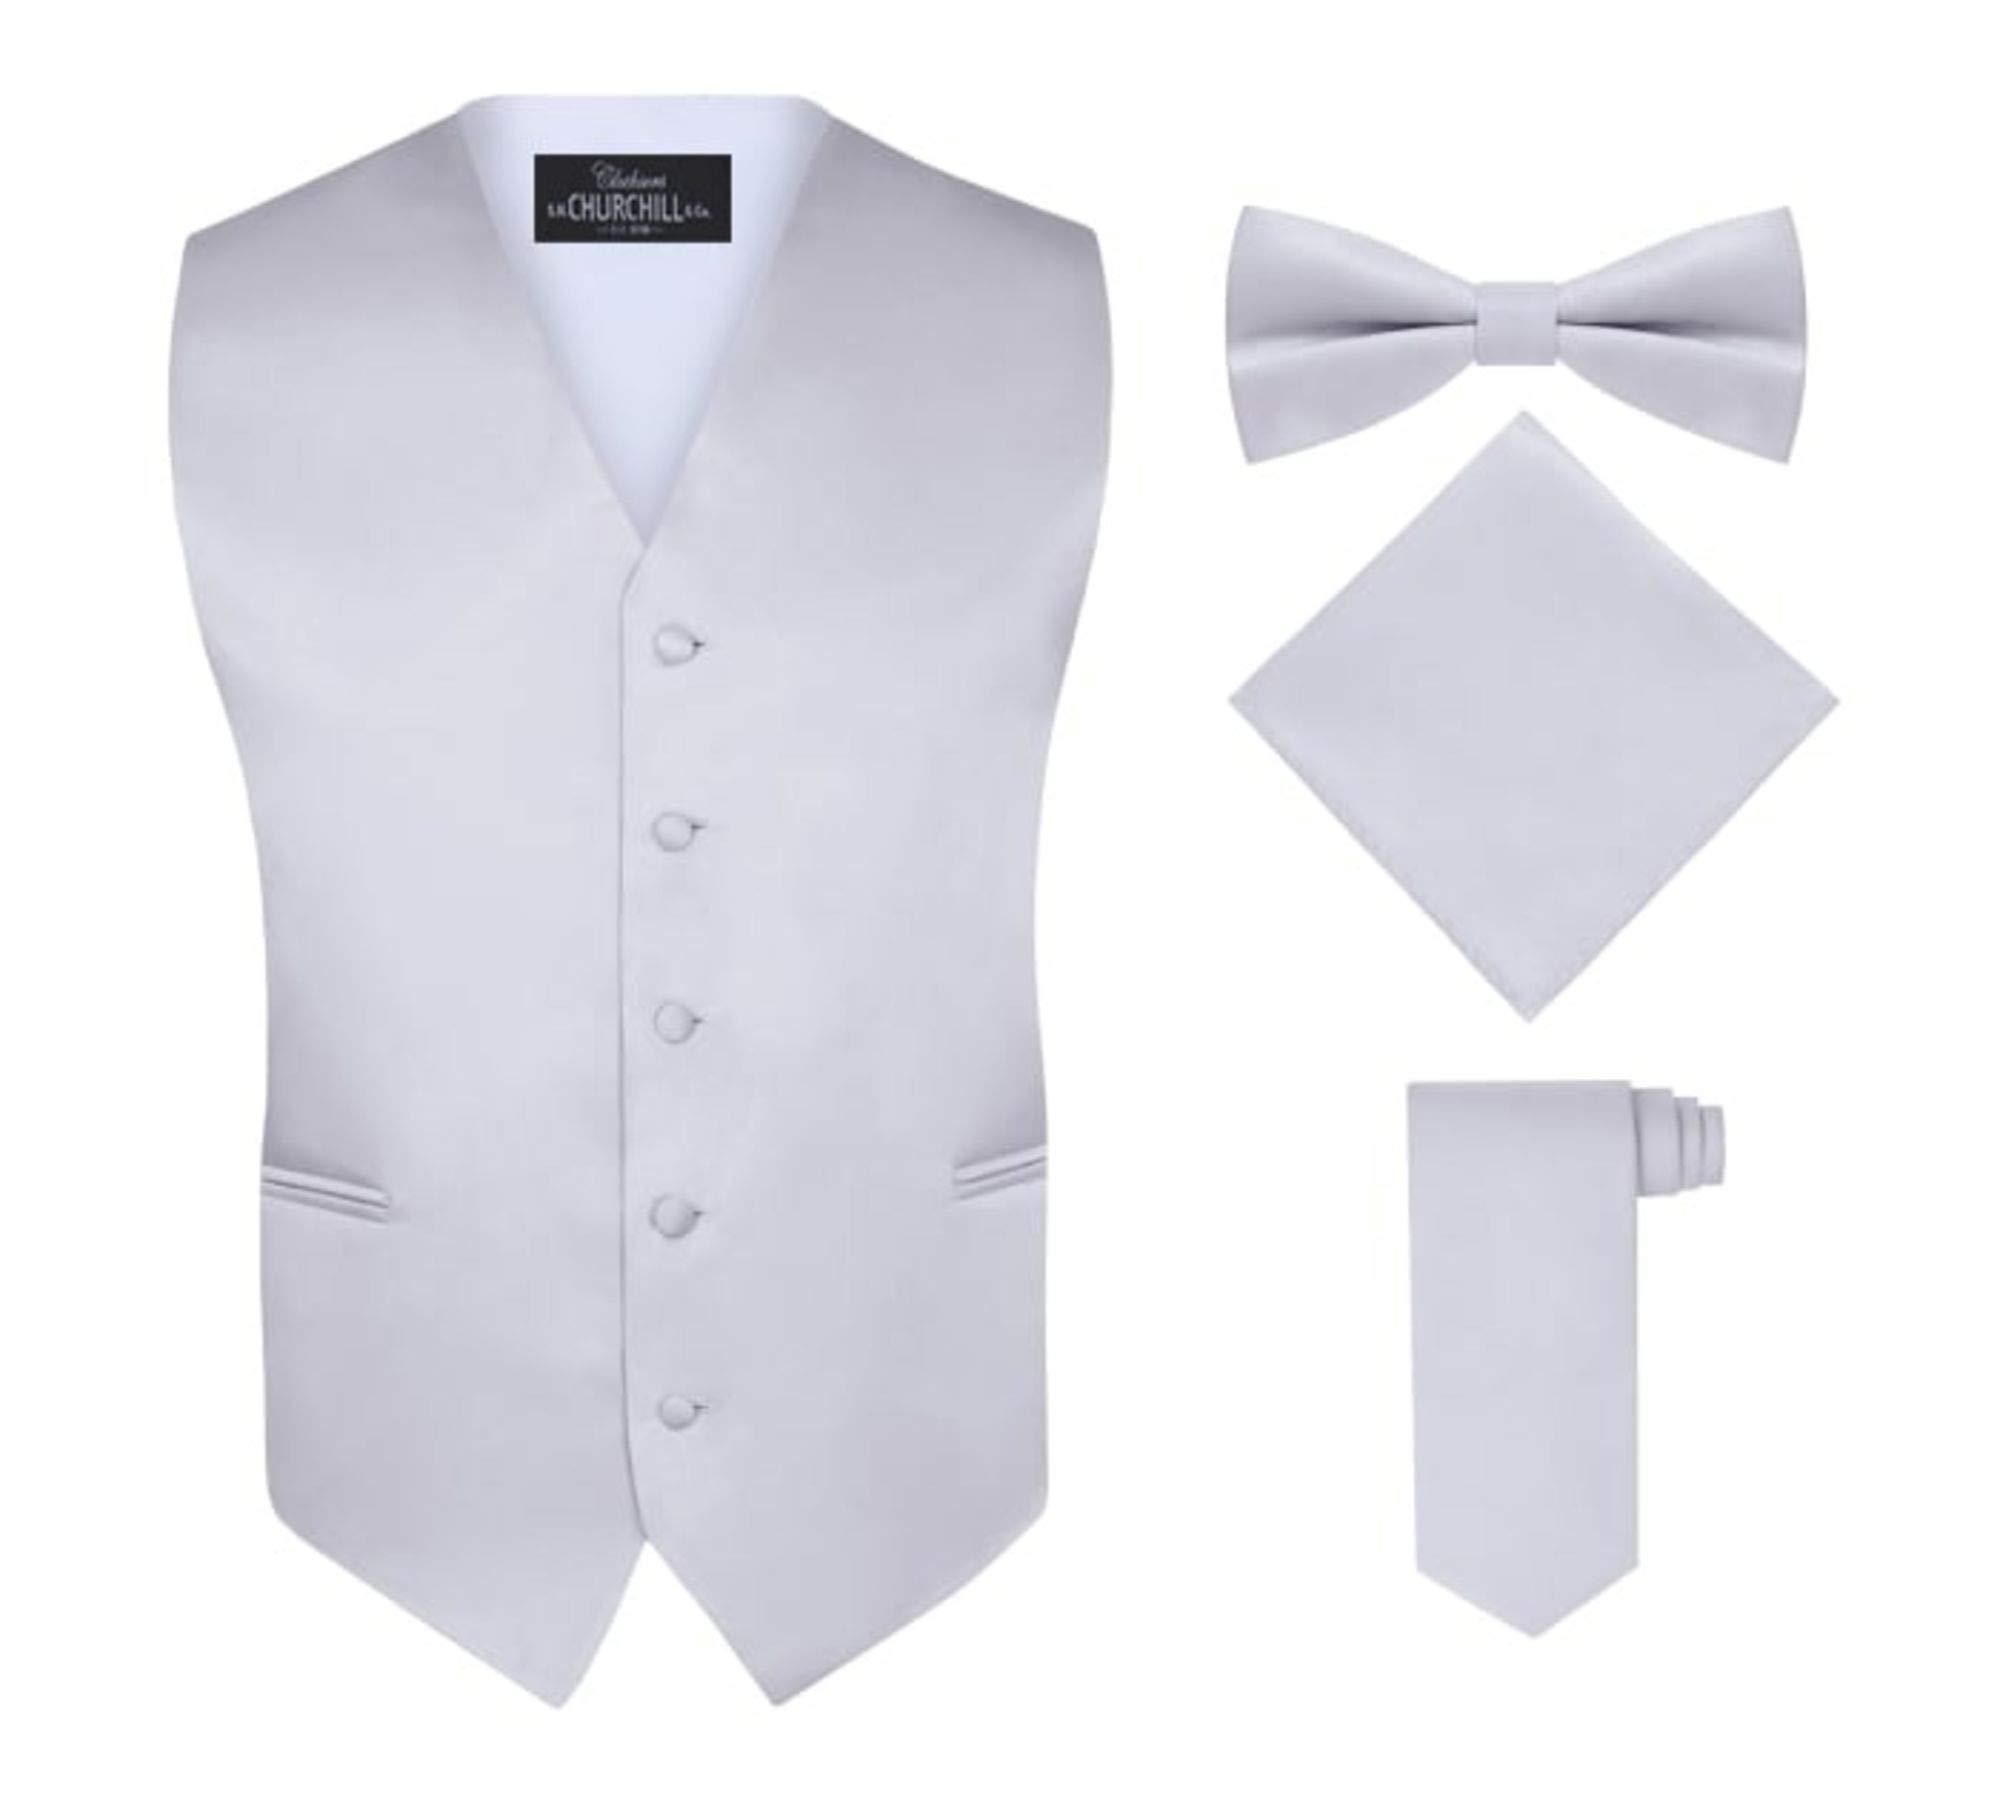 S.H. Churchill & Co. Men's 4 Piece Vest Set, with Bow Tie, Neck Tie & Pocket Hankie - Silver, M